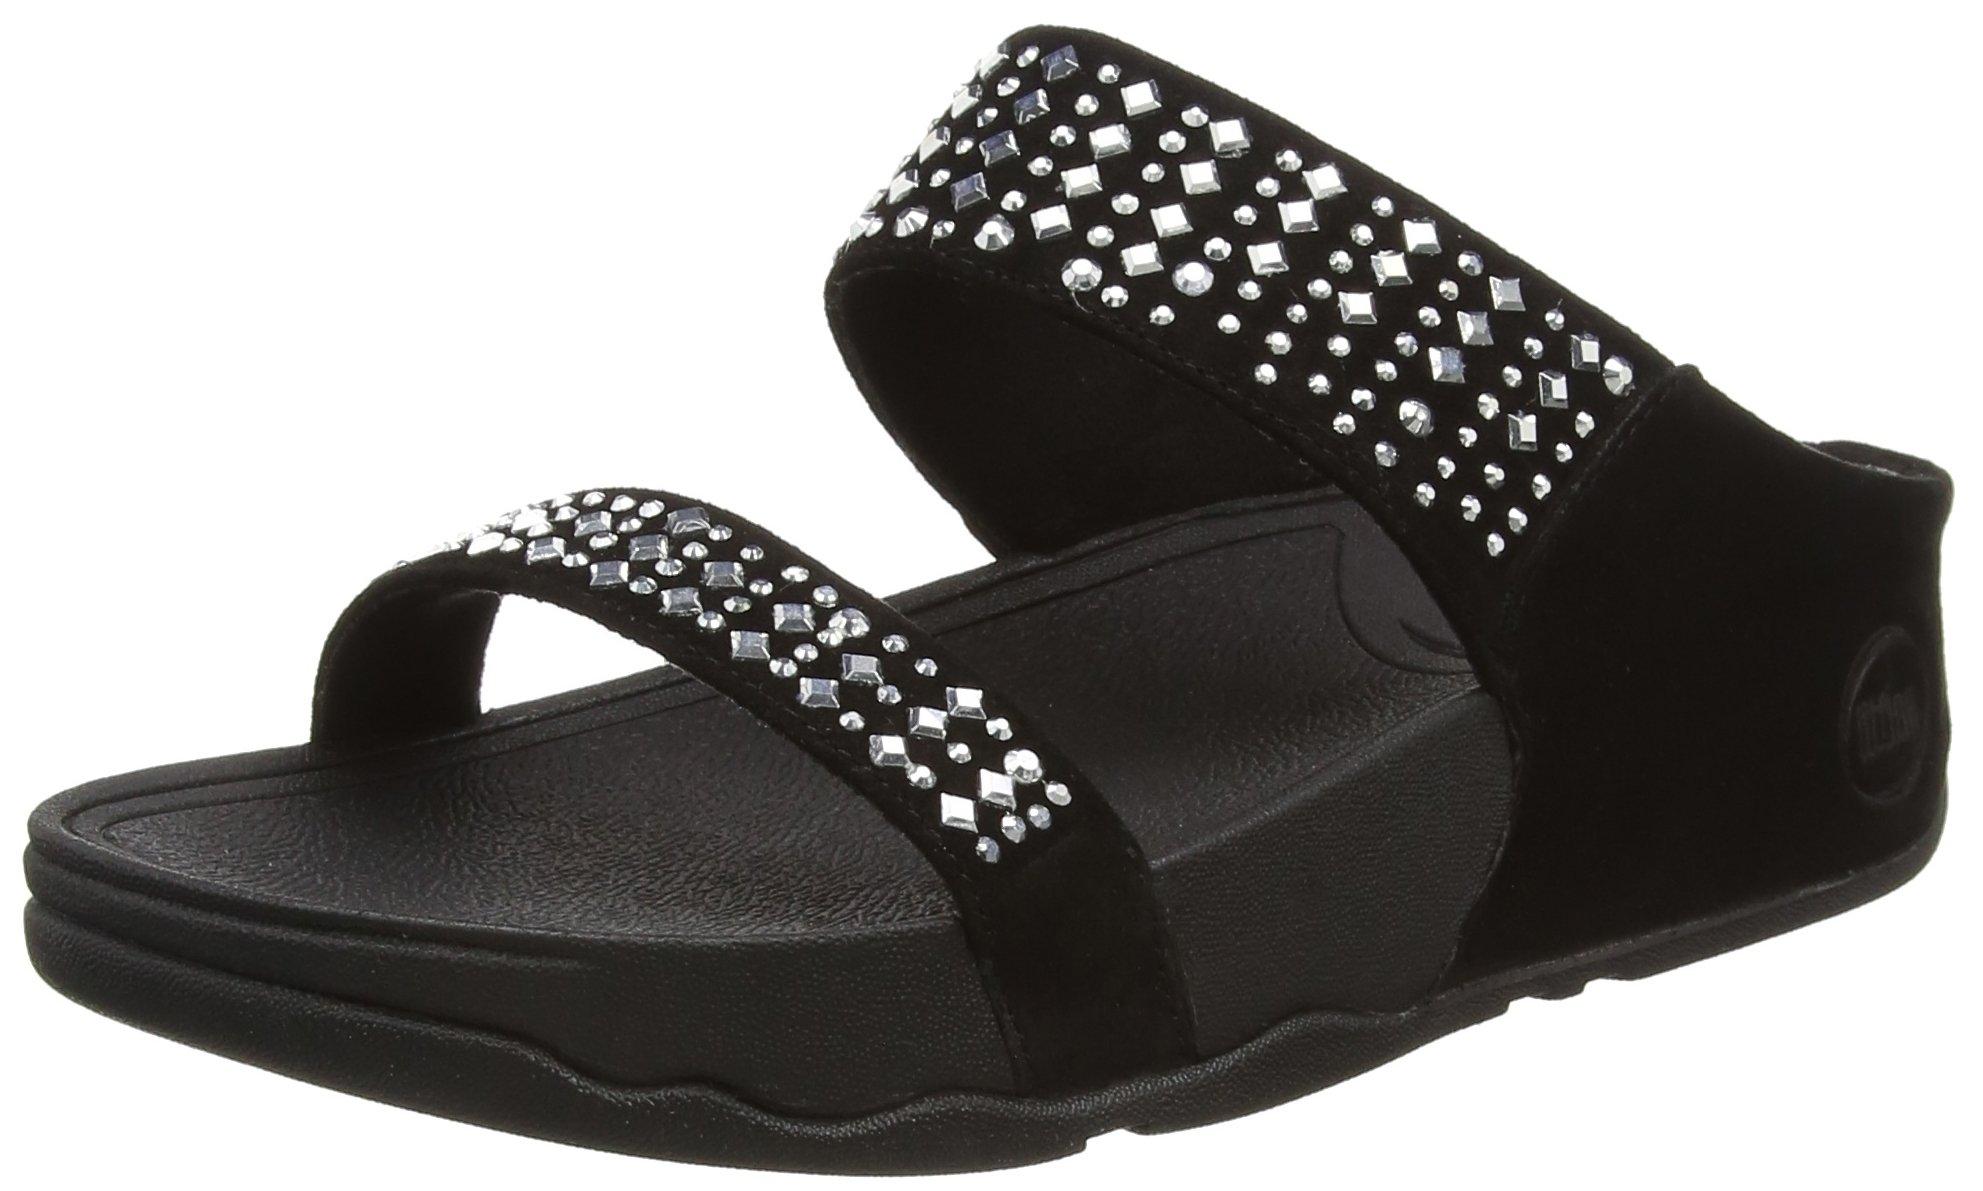 FitFlop Women's Novy Slide Sandal, black, 9 M US